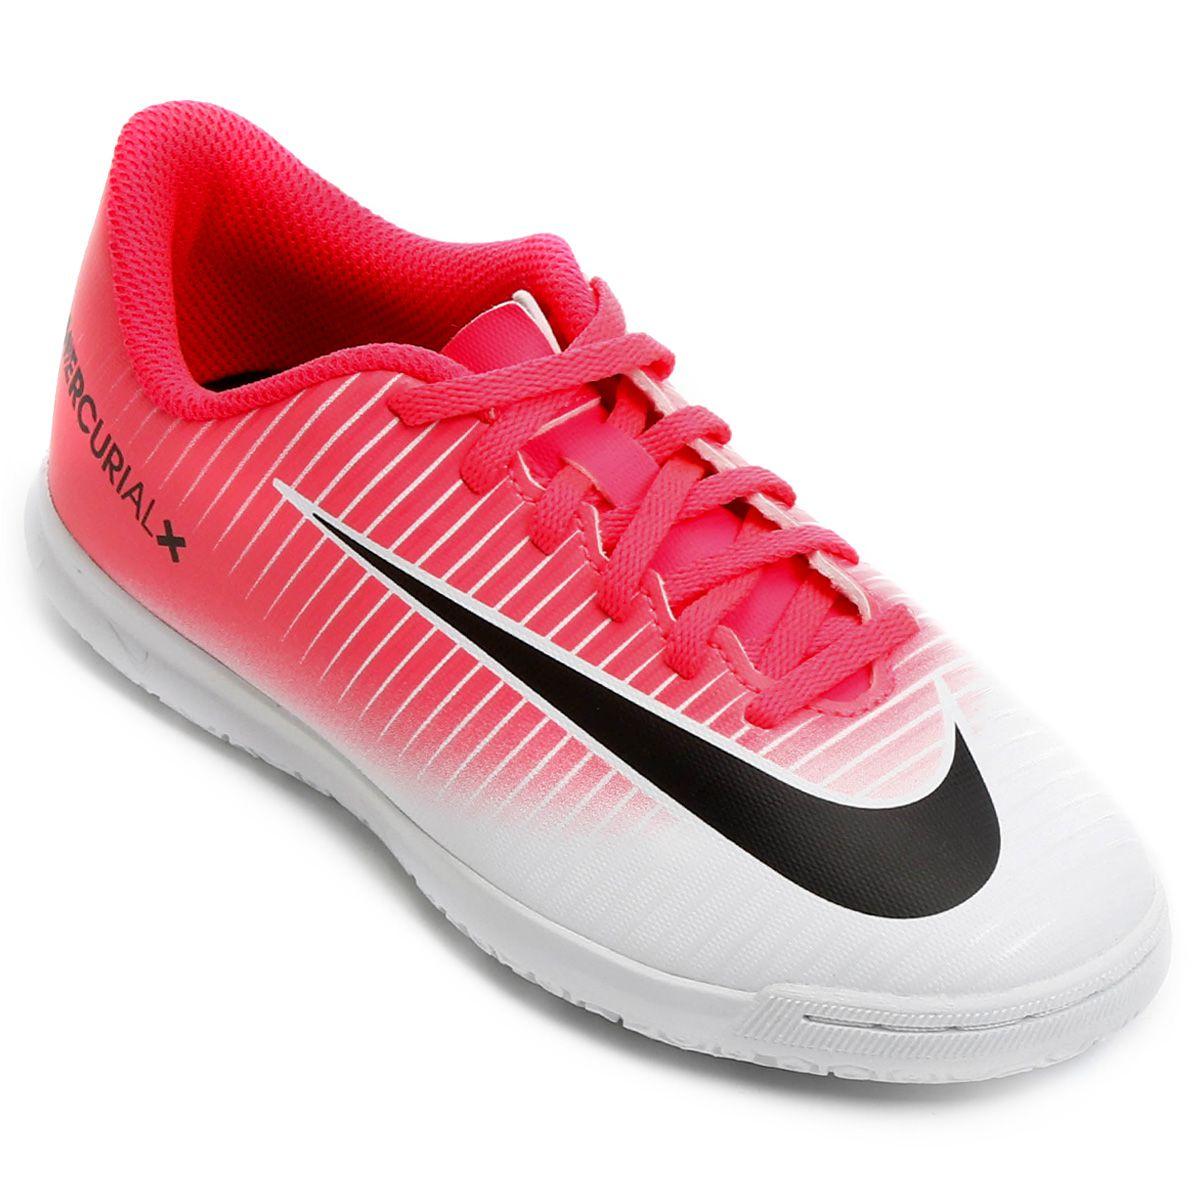 a65f8fdf5b5 Chuteira Futsal Infantil Nike Mercurial Vortex 3 IC - BRACIA SHOP ...